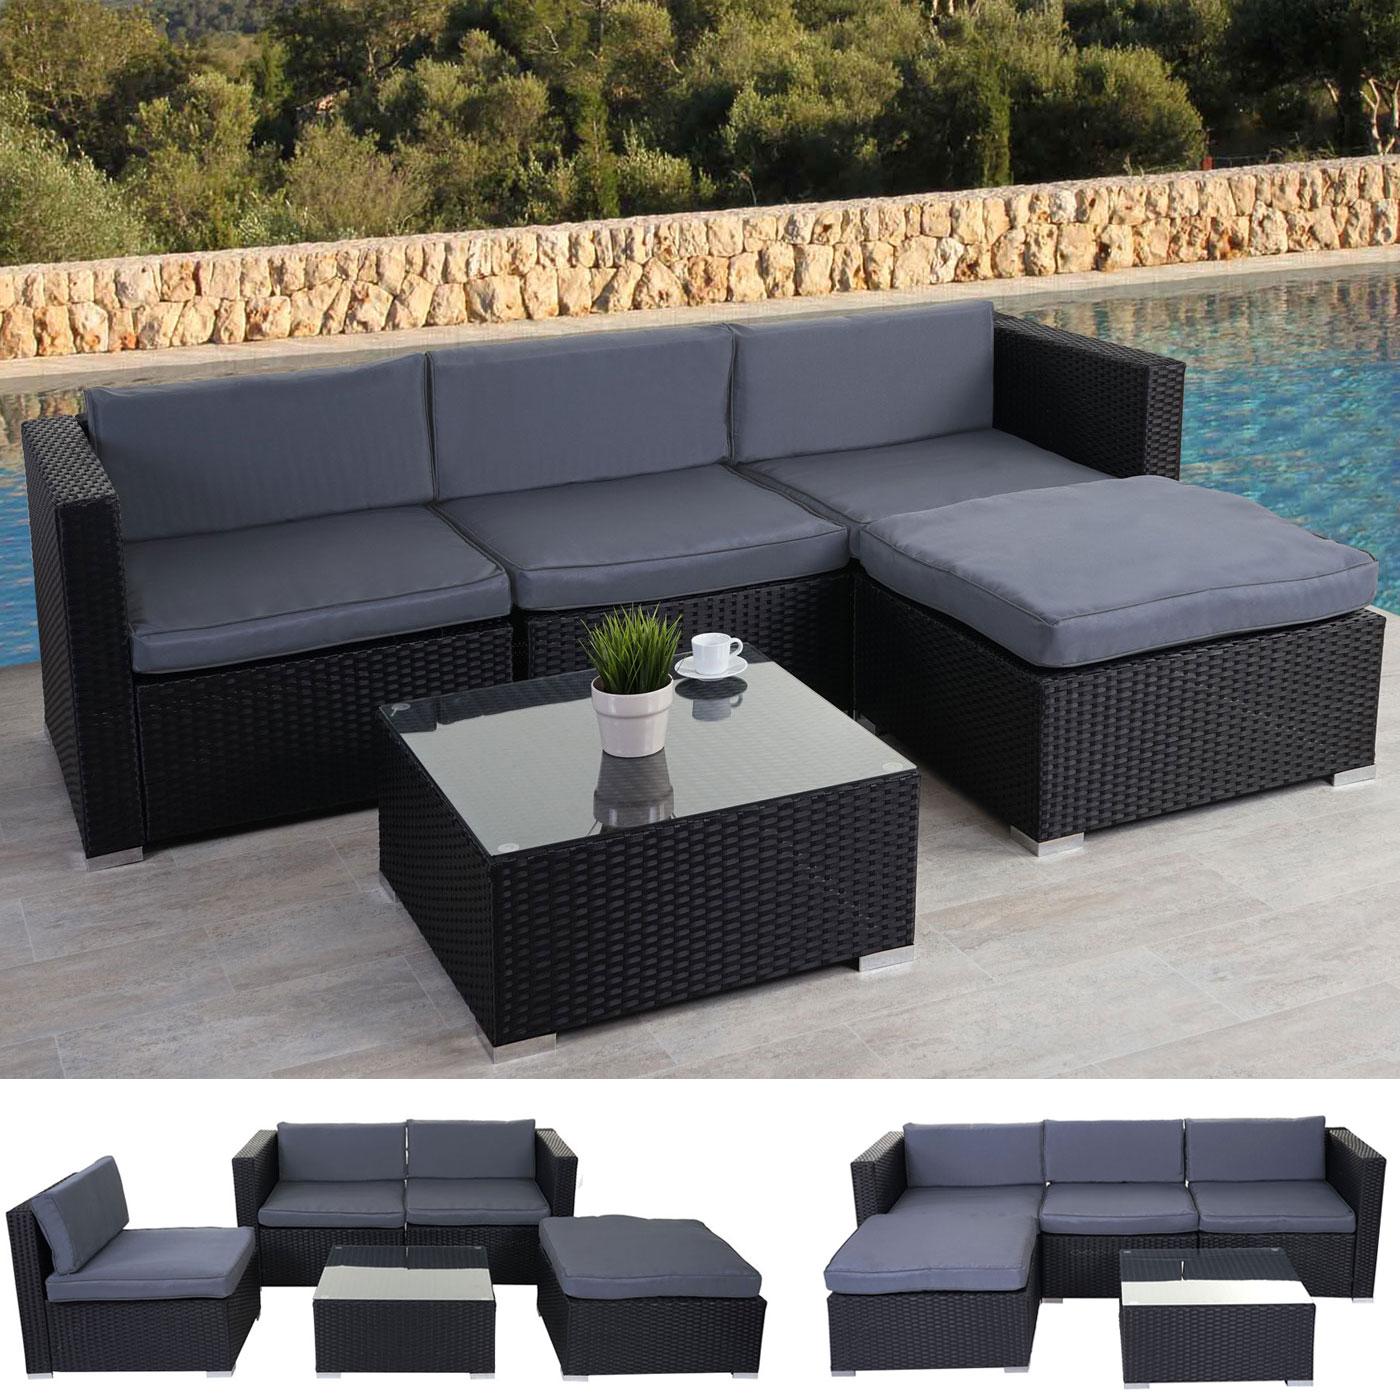 poly rattan garnitur marsala gartengarnitur lounge set schwarz kissen grau ebay. Black Bedroom Furniture Sets. Home Design Ideas